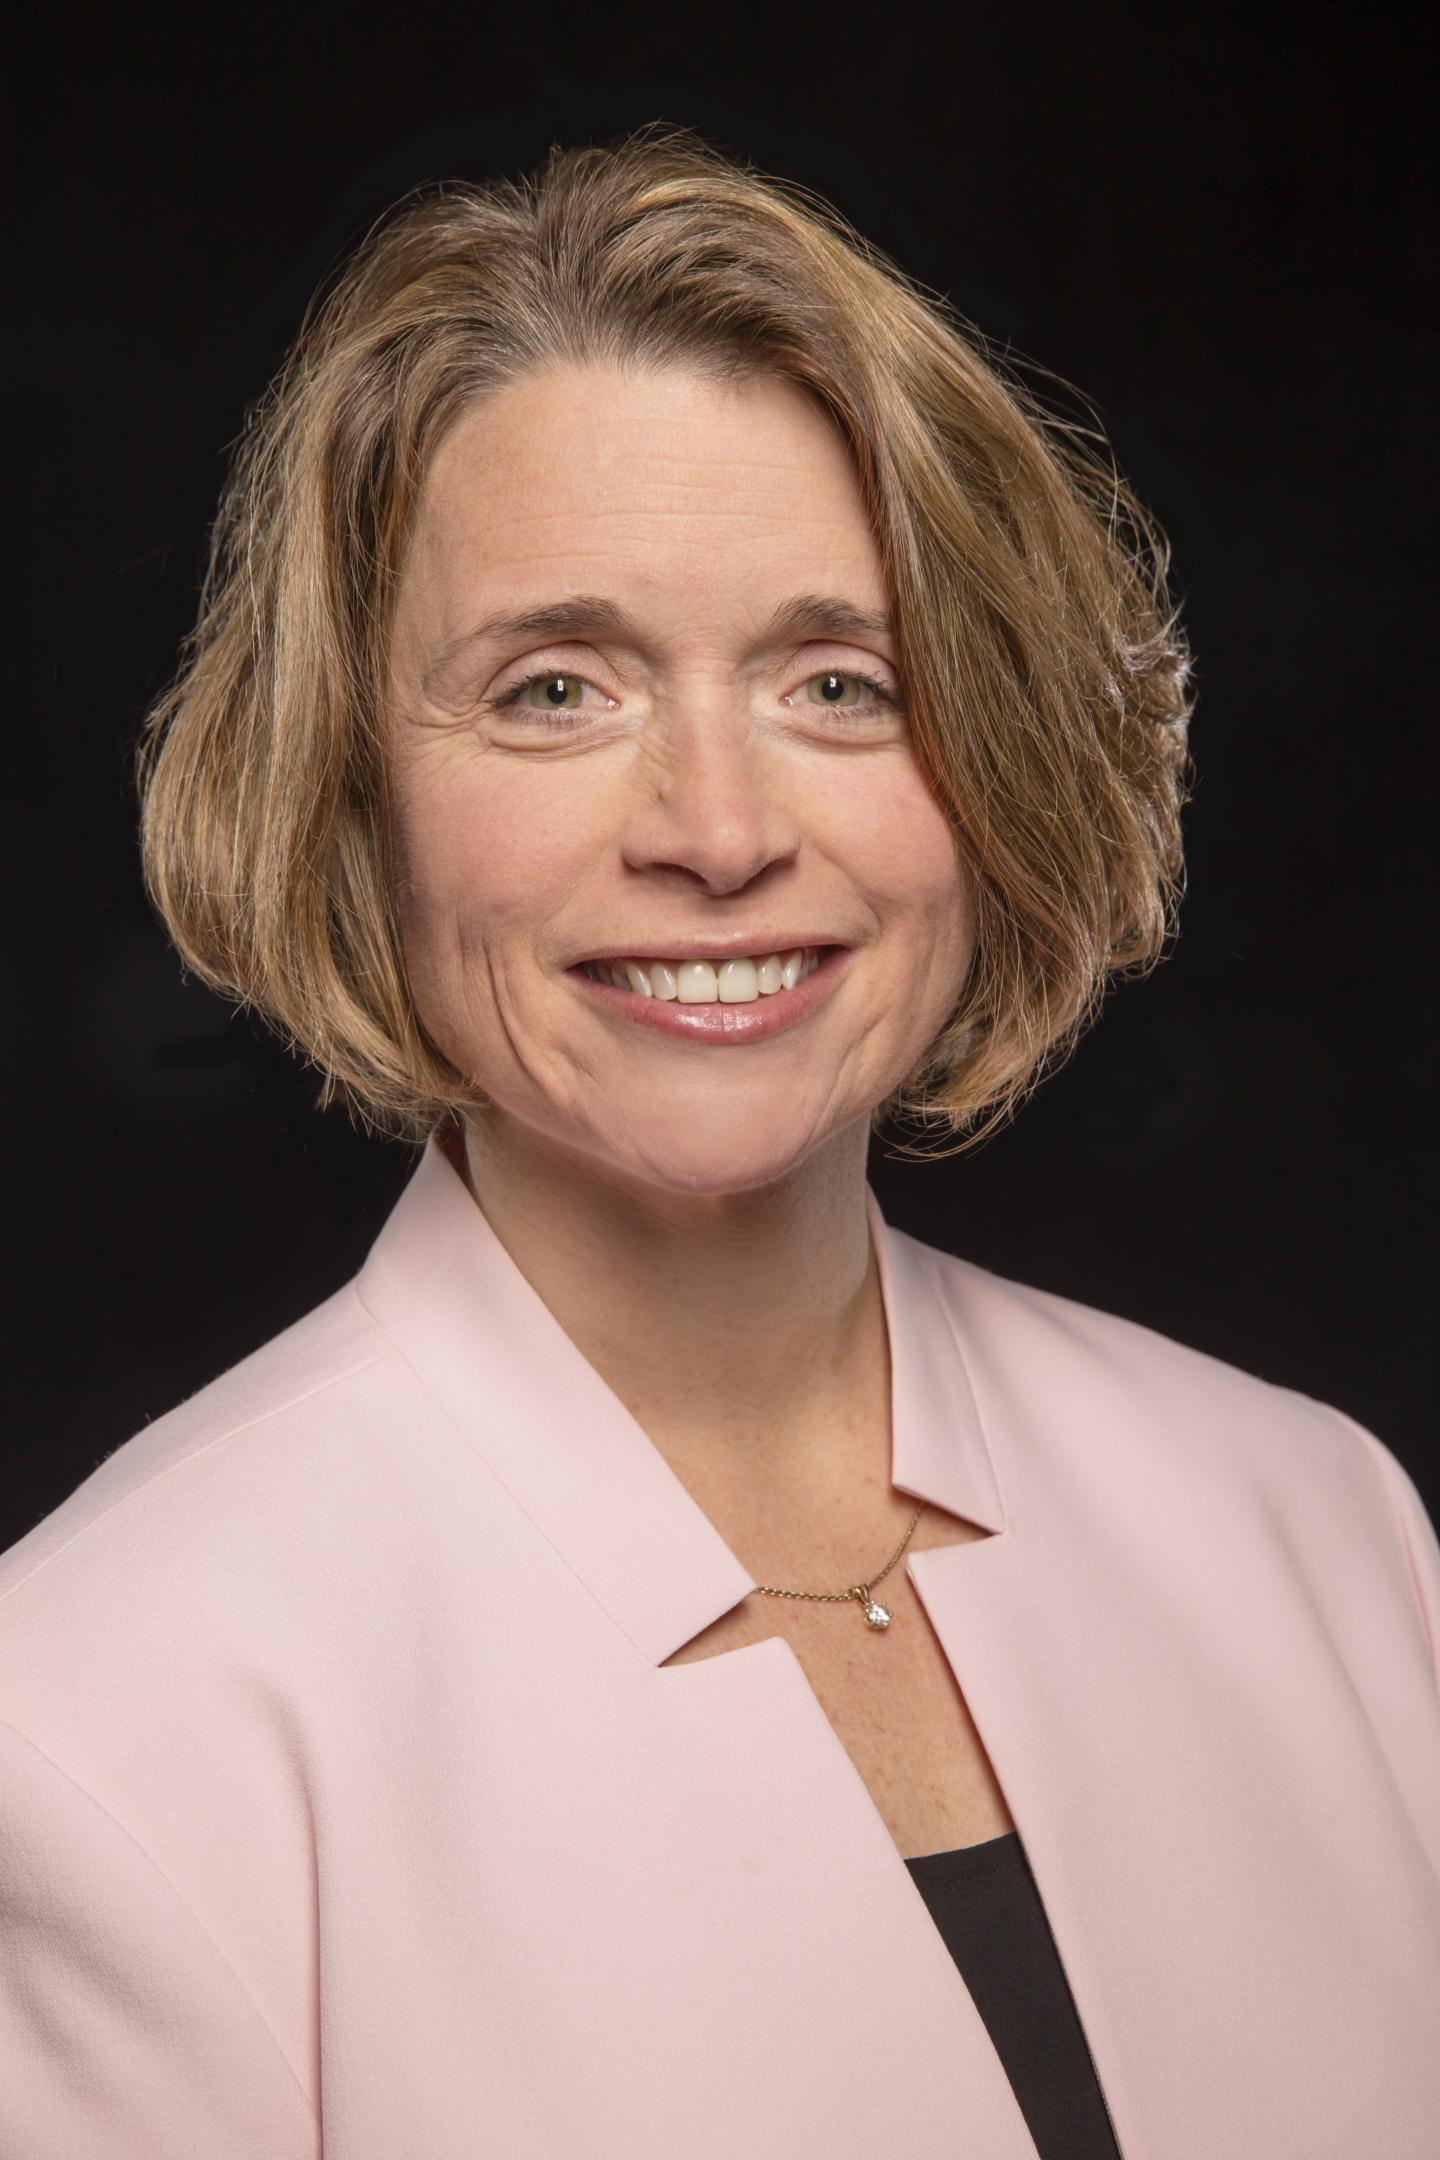 Nancy Chiaravalloti, Ph.D., Kessler Foundation